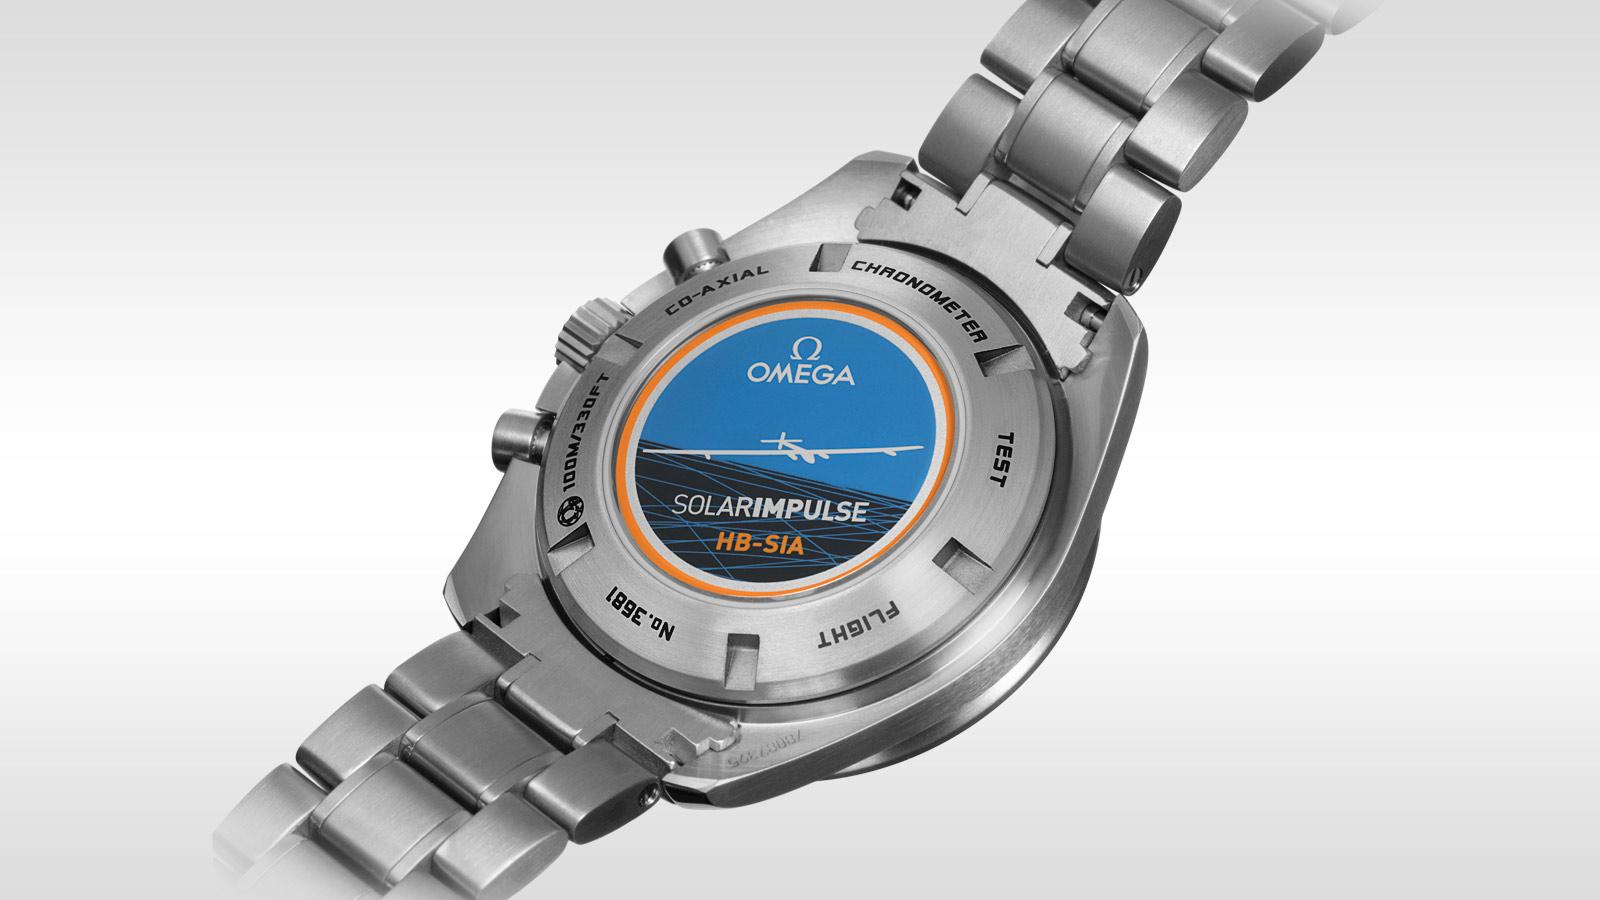 Speedmaster SOLAR IMPULSE HB‑SIA腕表 HB‑SIA腕表 44.25毫米同轴GMT 编号版计时表 - 321.90.44.52.01.001 - 查看 2